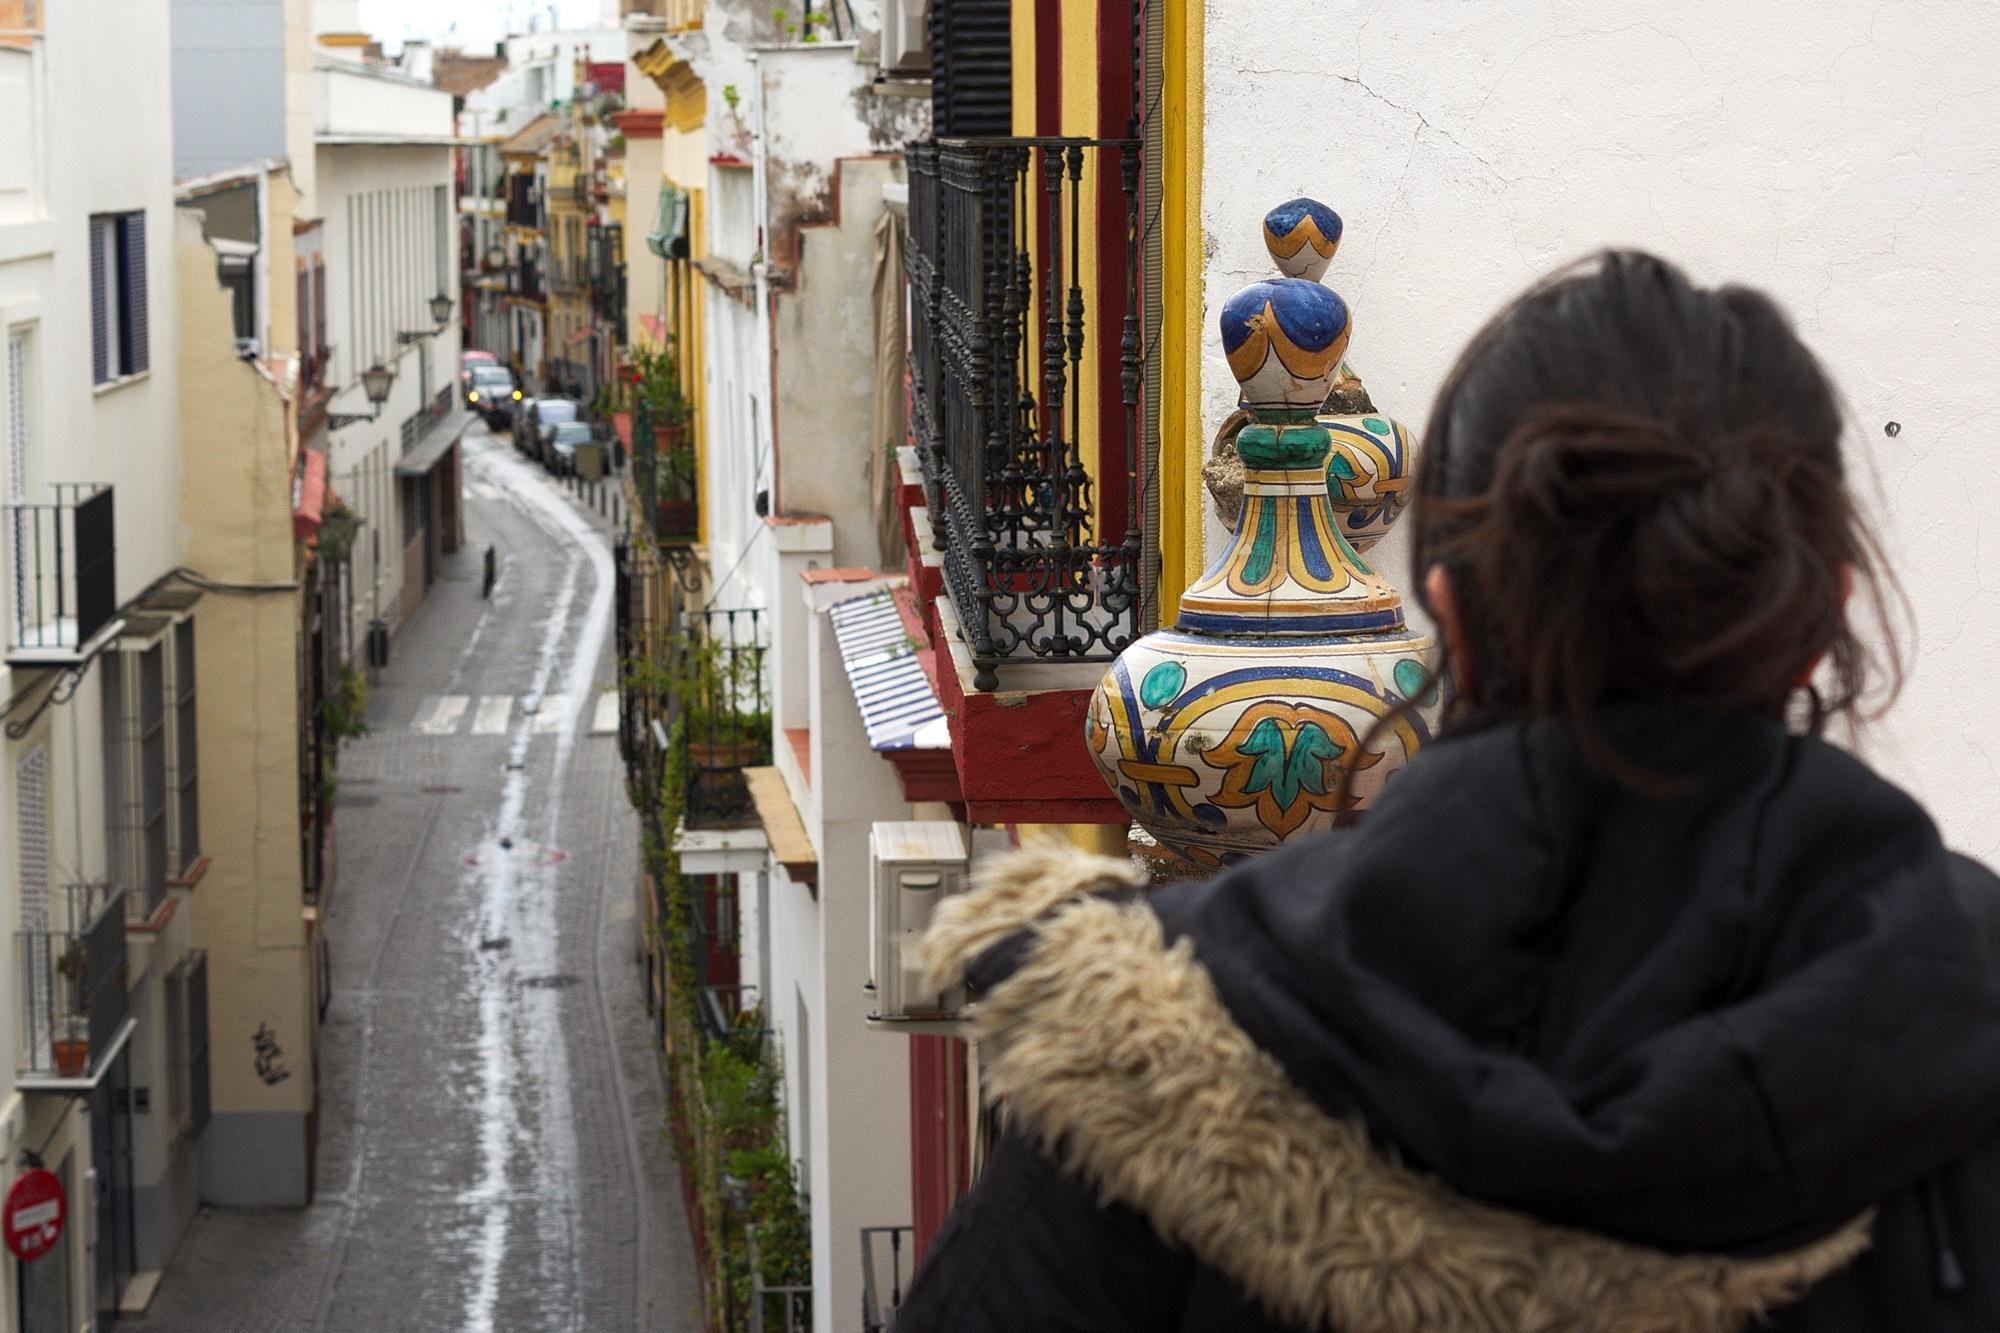 Reife Paare, die Sexin in Andalusien haben